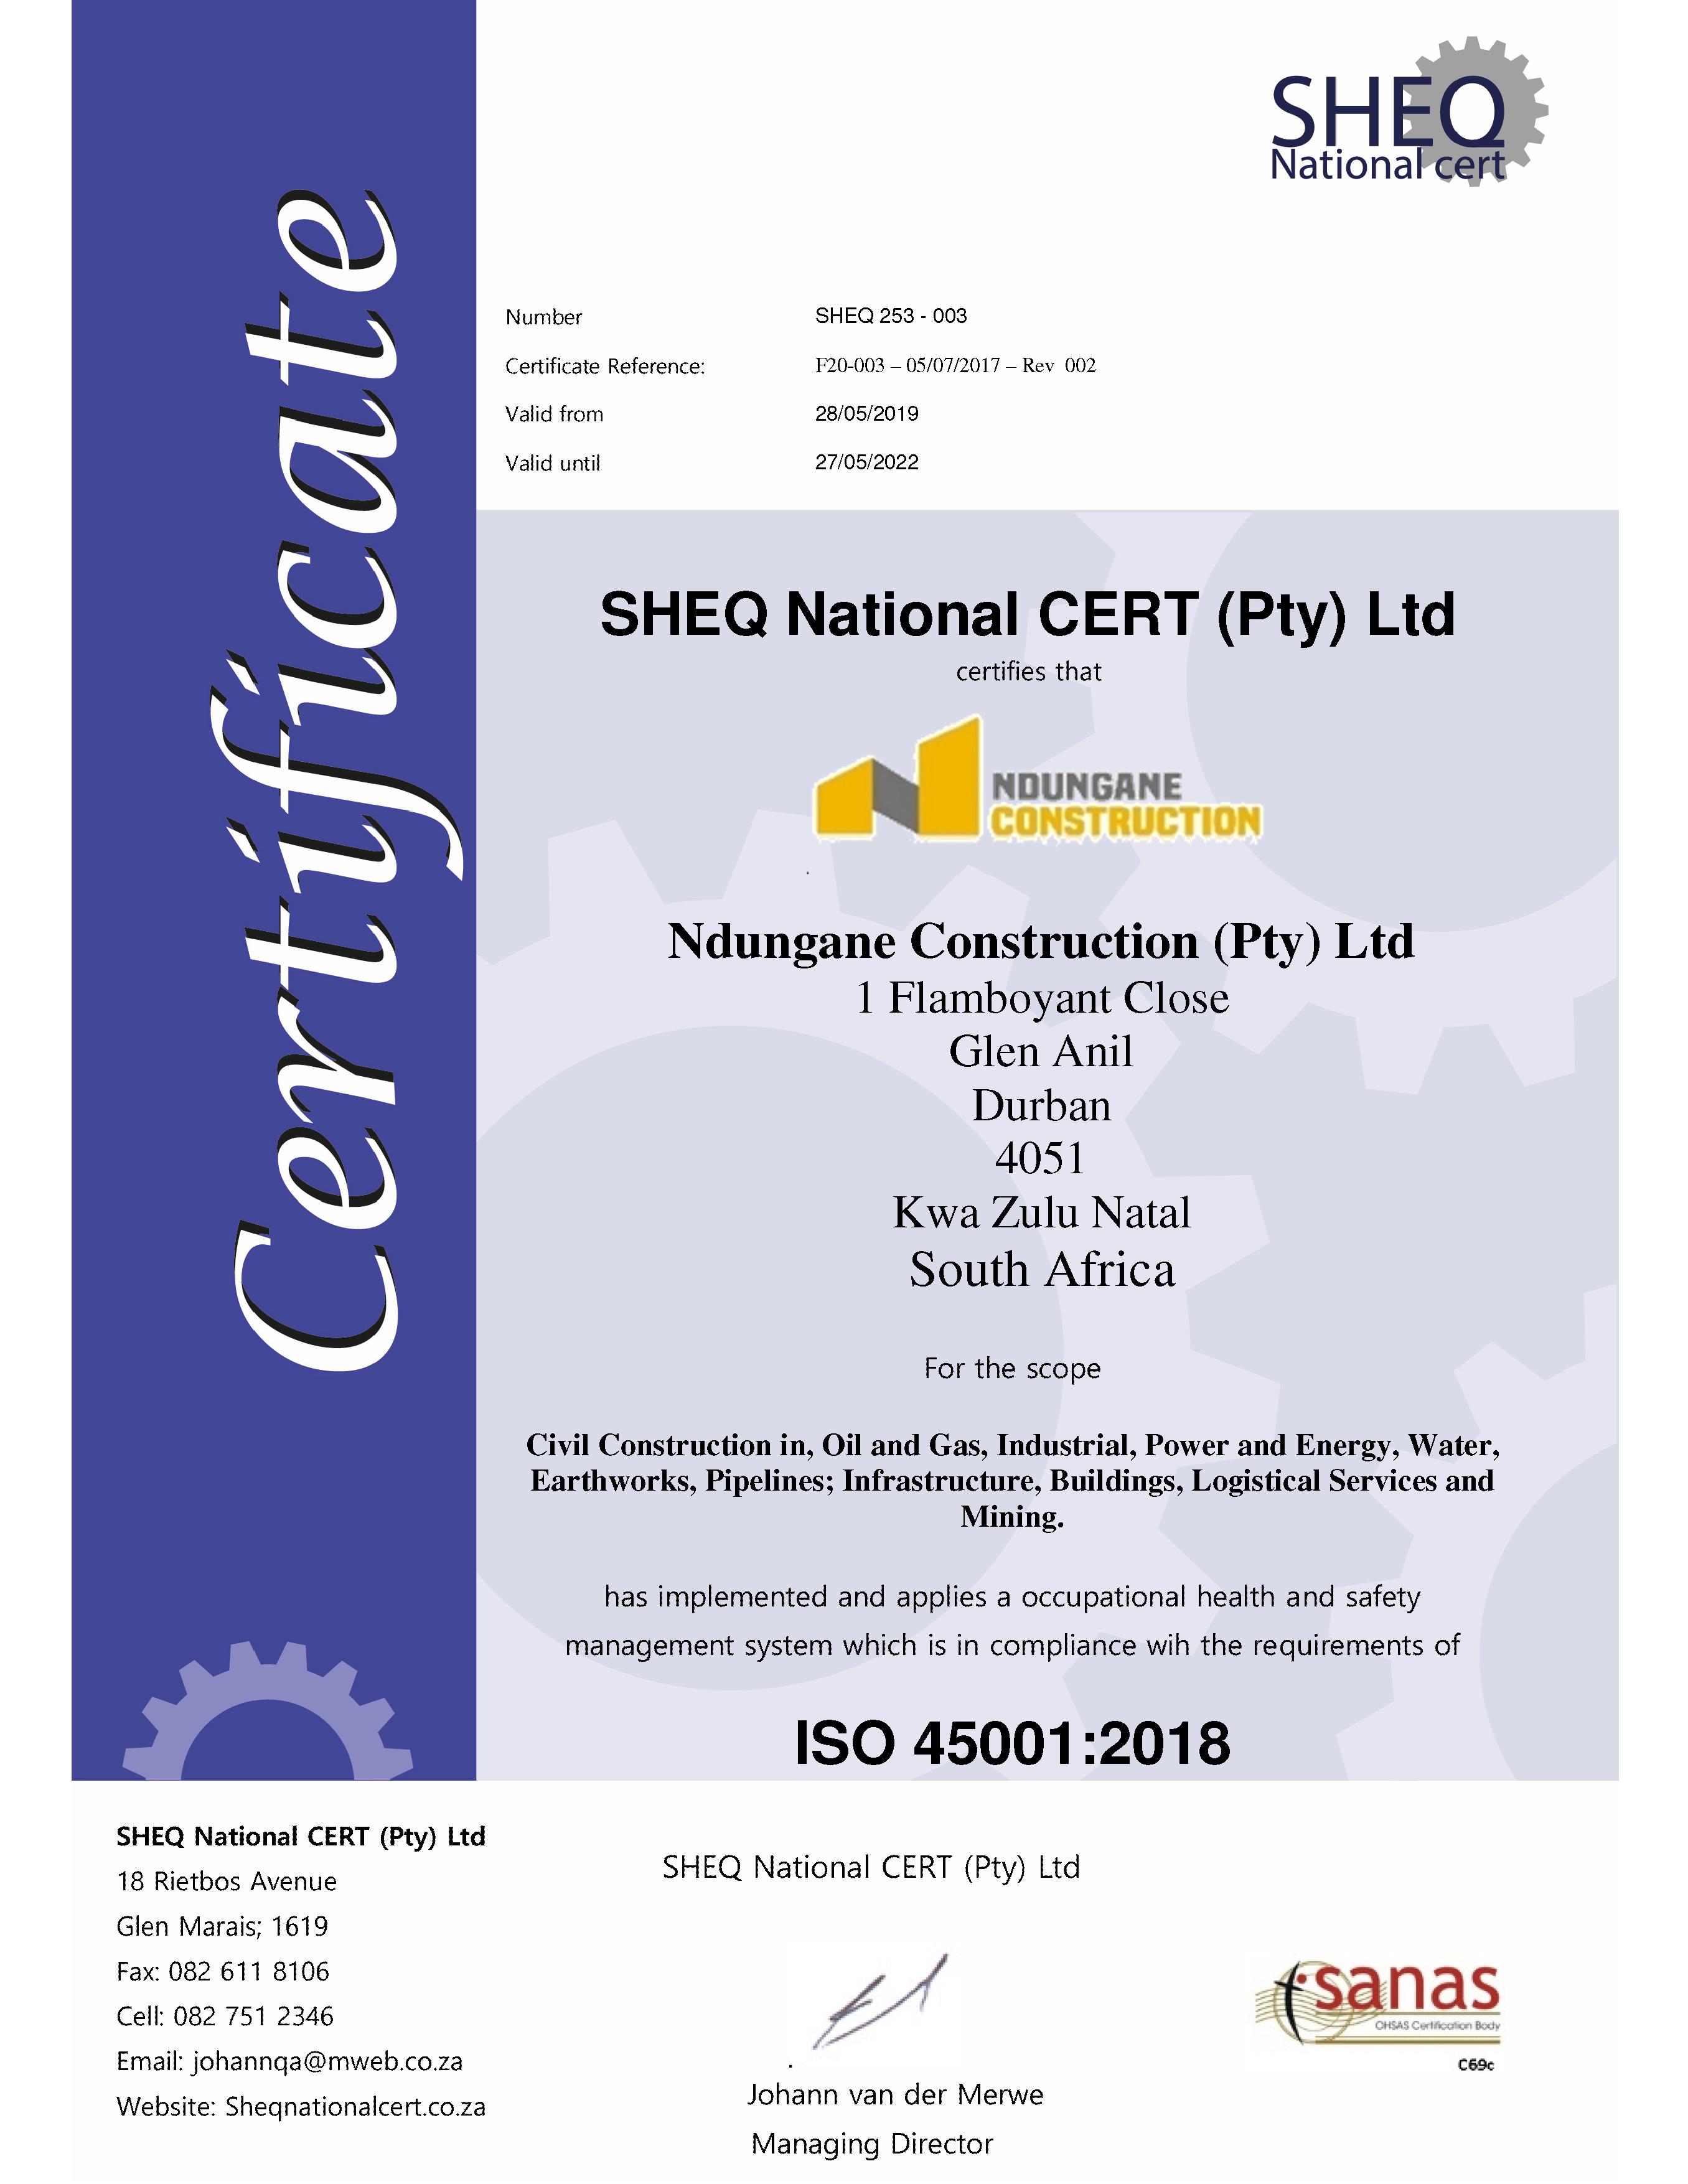 sheq-253-f20-003-sheq-national-cert-certificate-ohsas